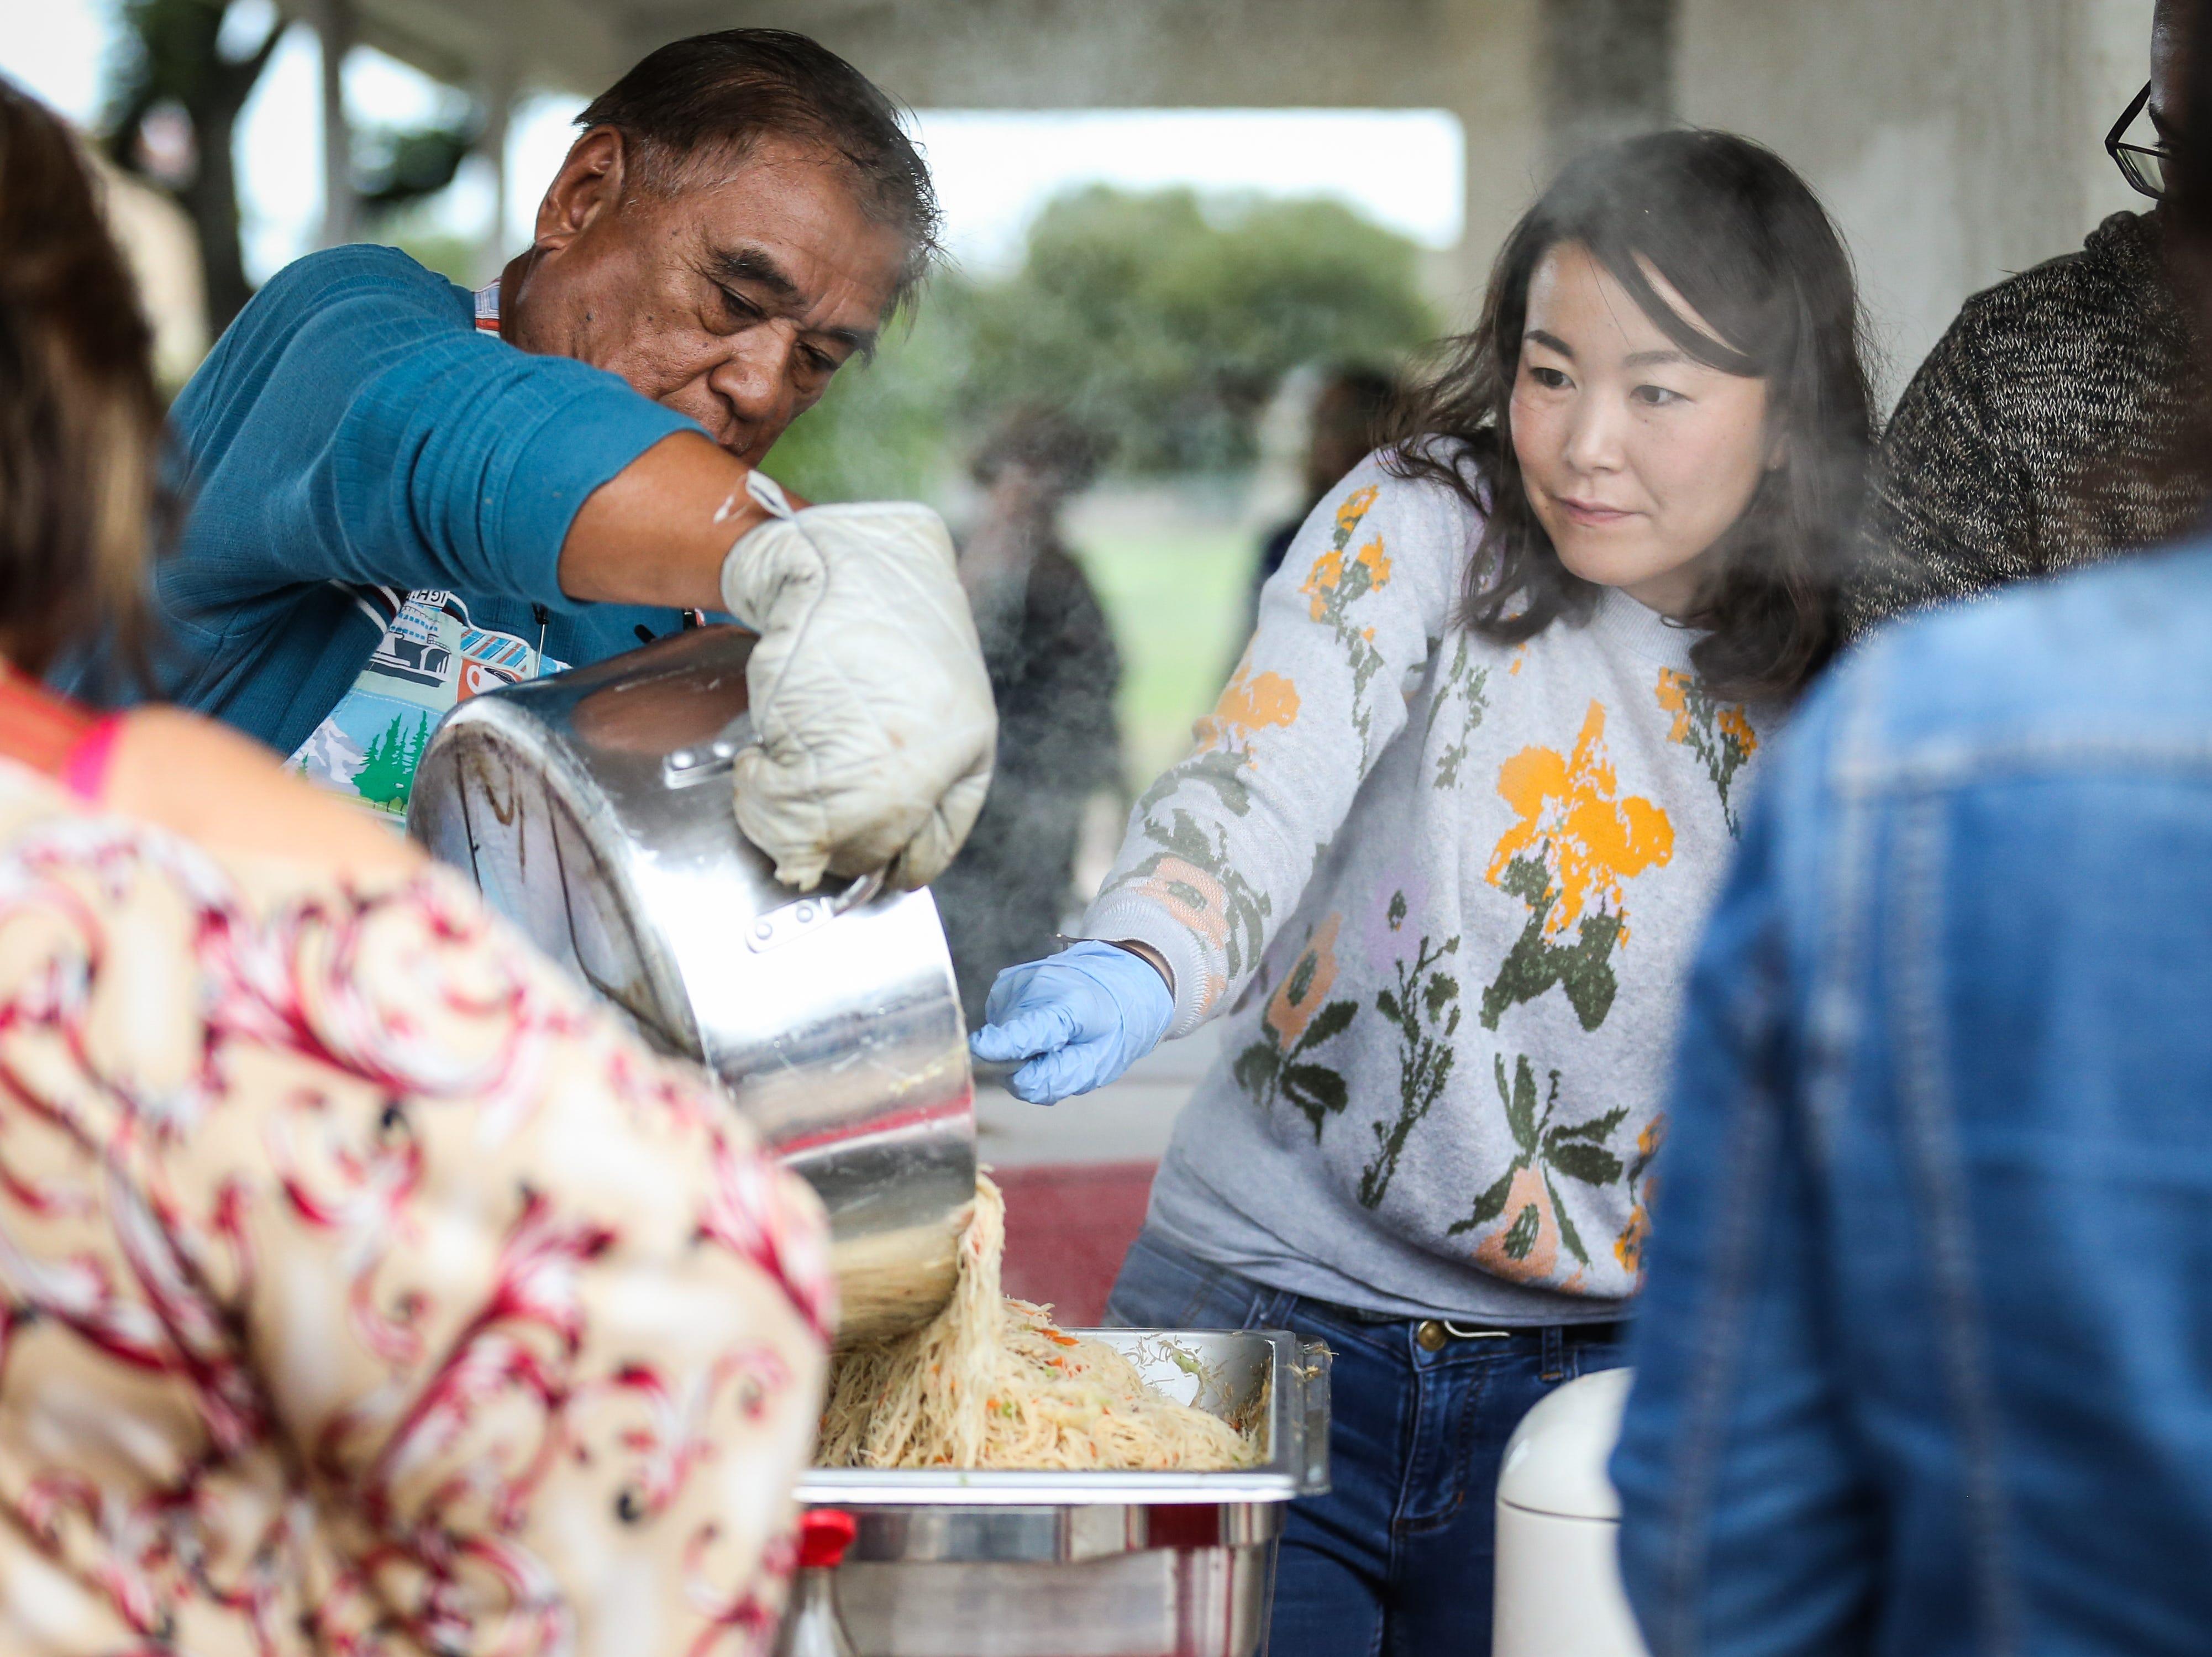 Vendors pour out noodles to a serving tray during the Asian Bazaar Saturday, Oct. 20, 2018, at El Paseo de Santa Angela.